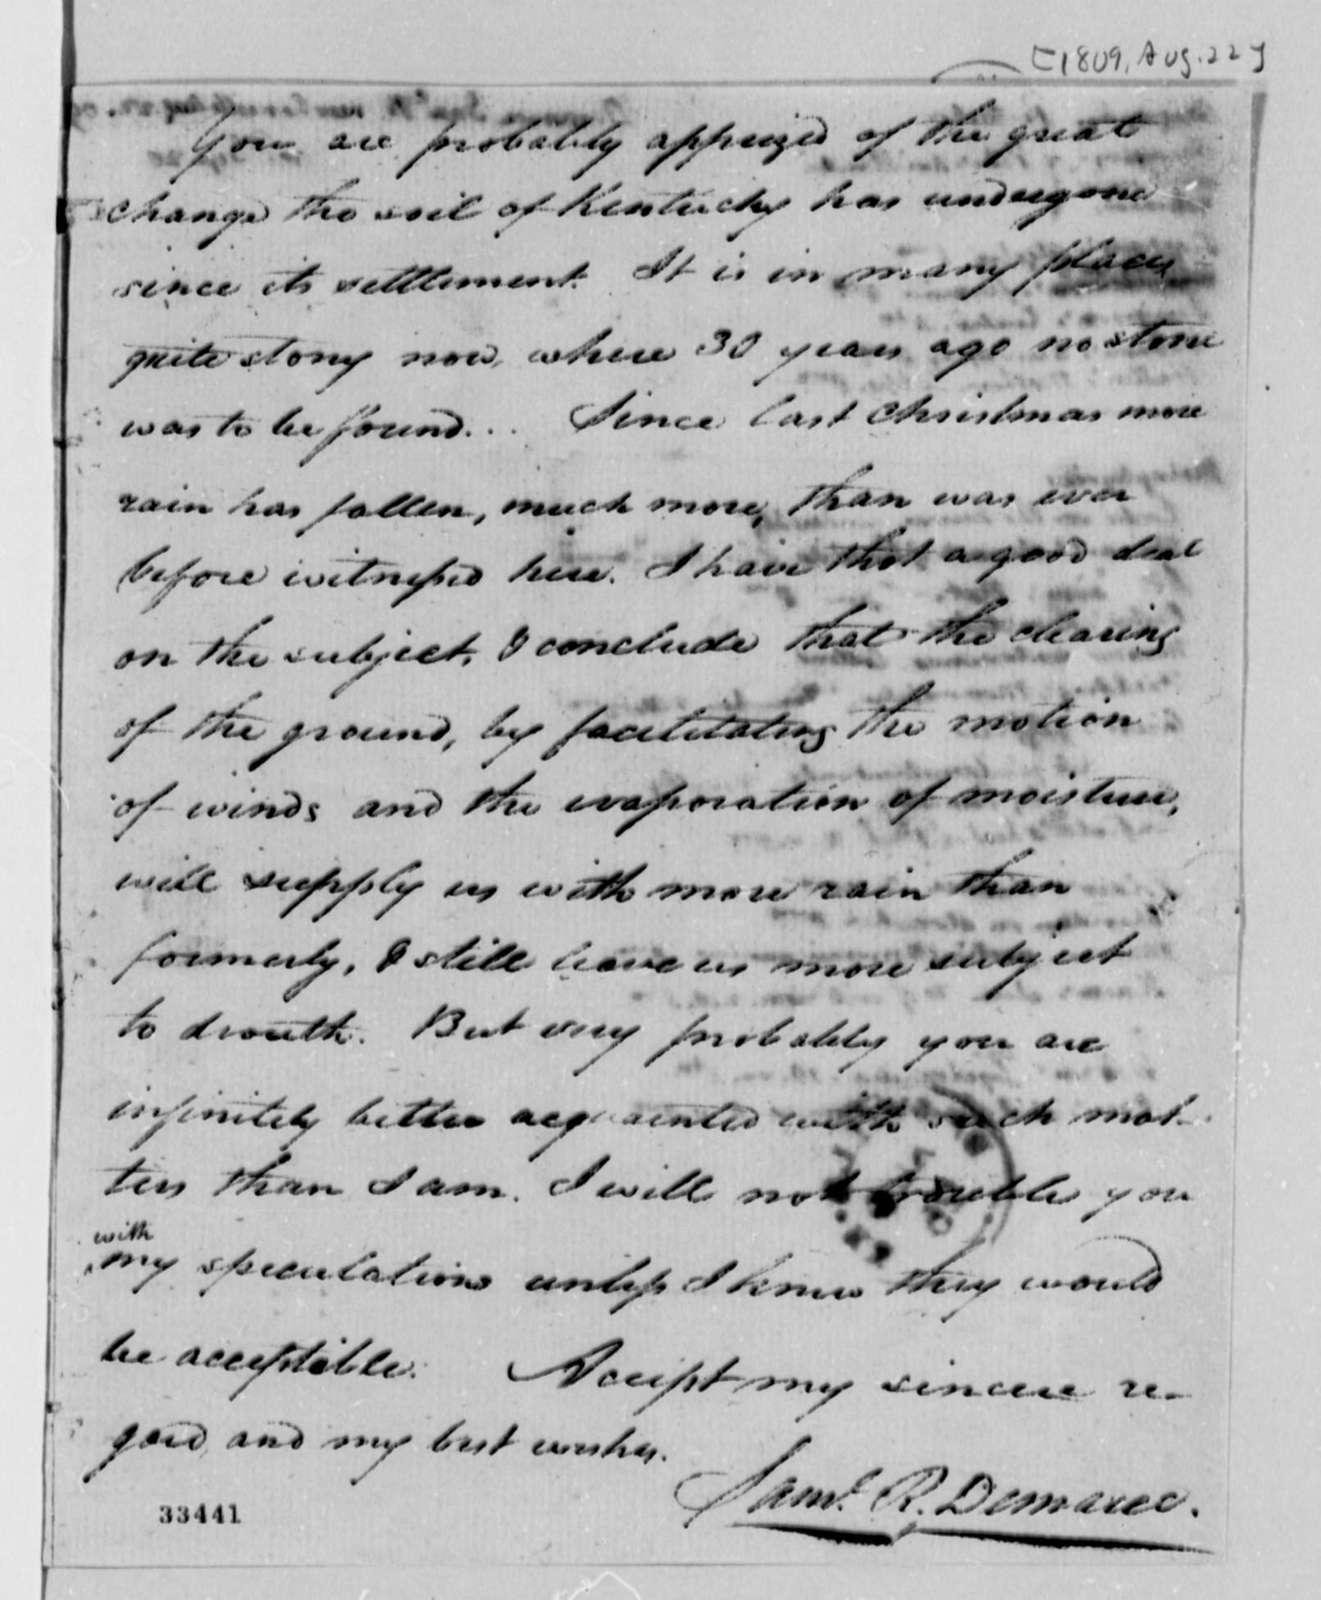 Samuel R. Demaree to Thomas Jefferson, August 22, 1809, with Thomas Jefferson List